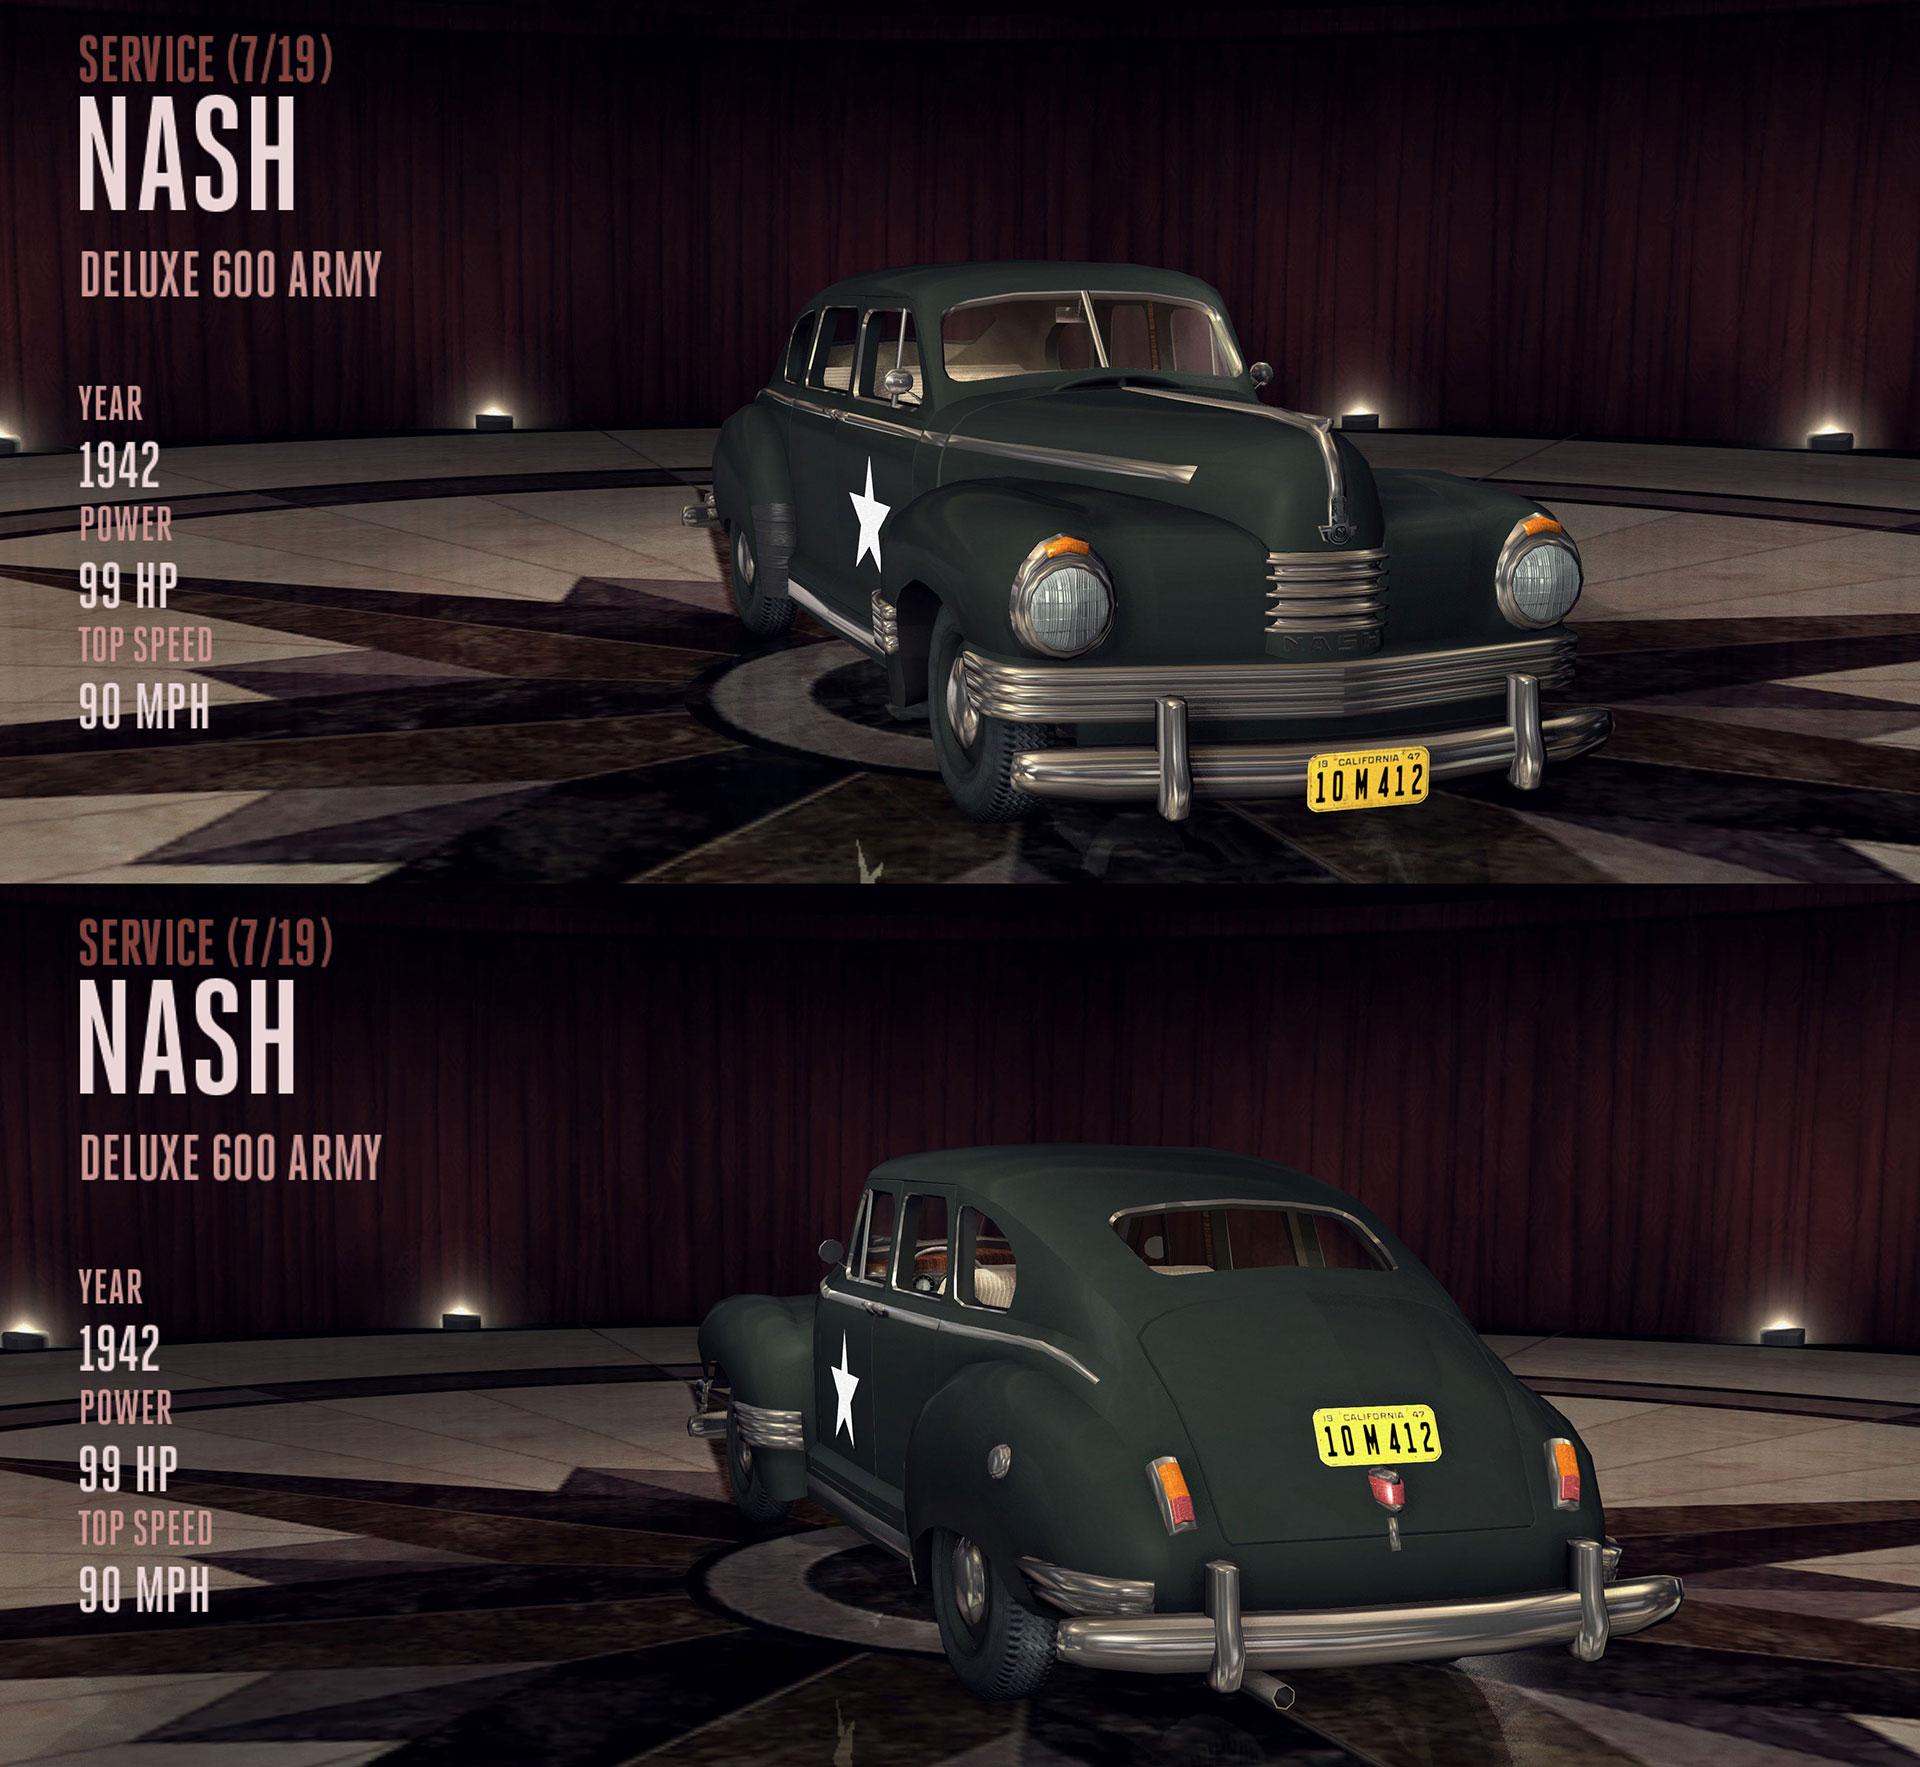 Archivo:1942-nash-deluxe-600-army.jpg